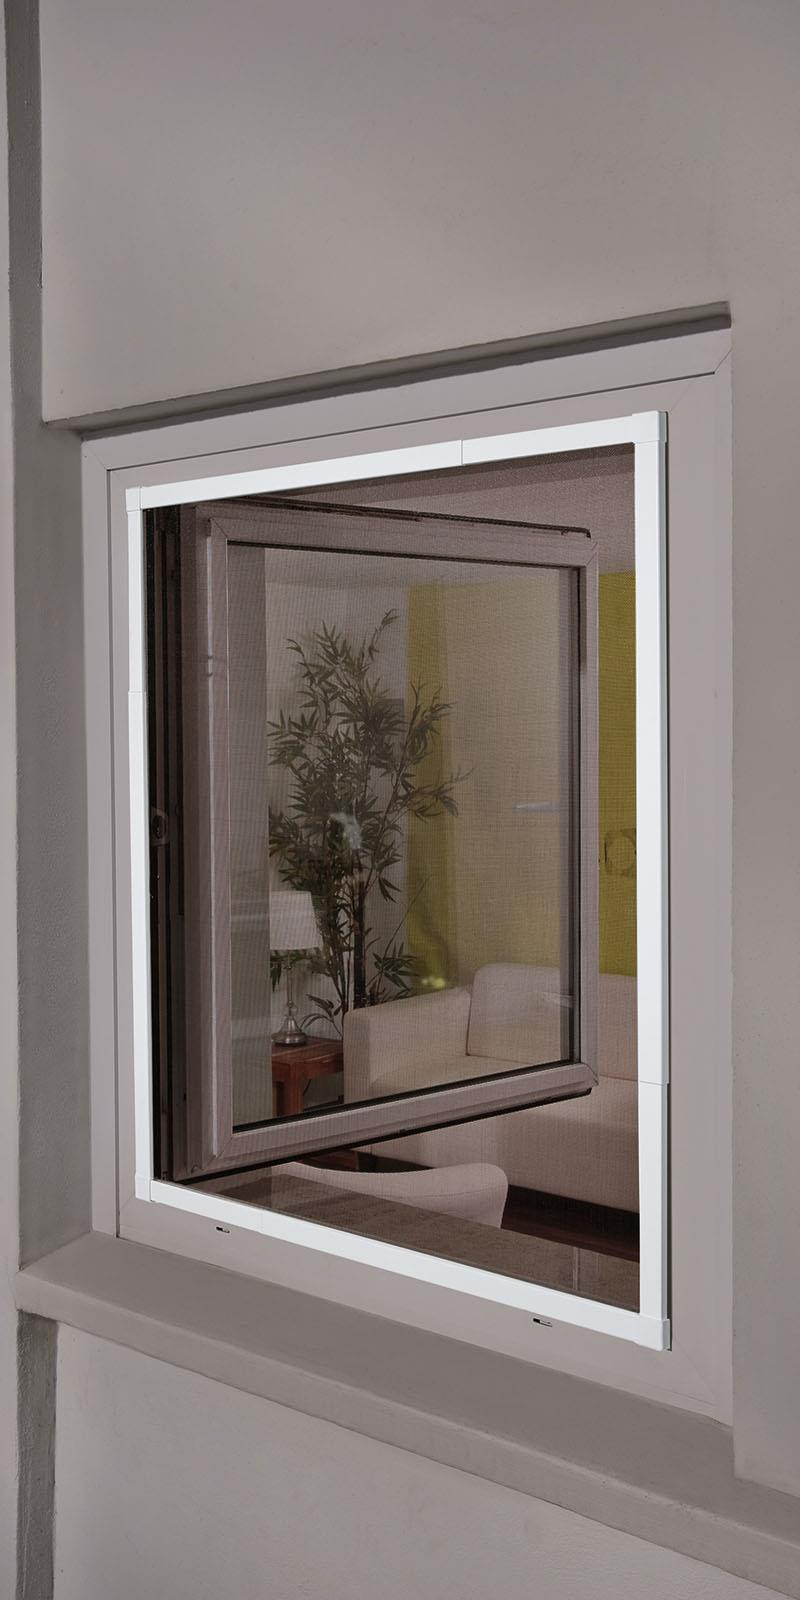 insektenschutz f r fenster teleskopierbar 120x140 weiss ral 9016 fliegengitter p ebay. Black Bedroom Furniture Sets. Home Design Ideas